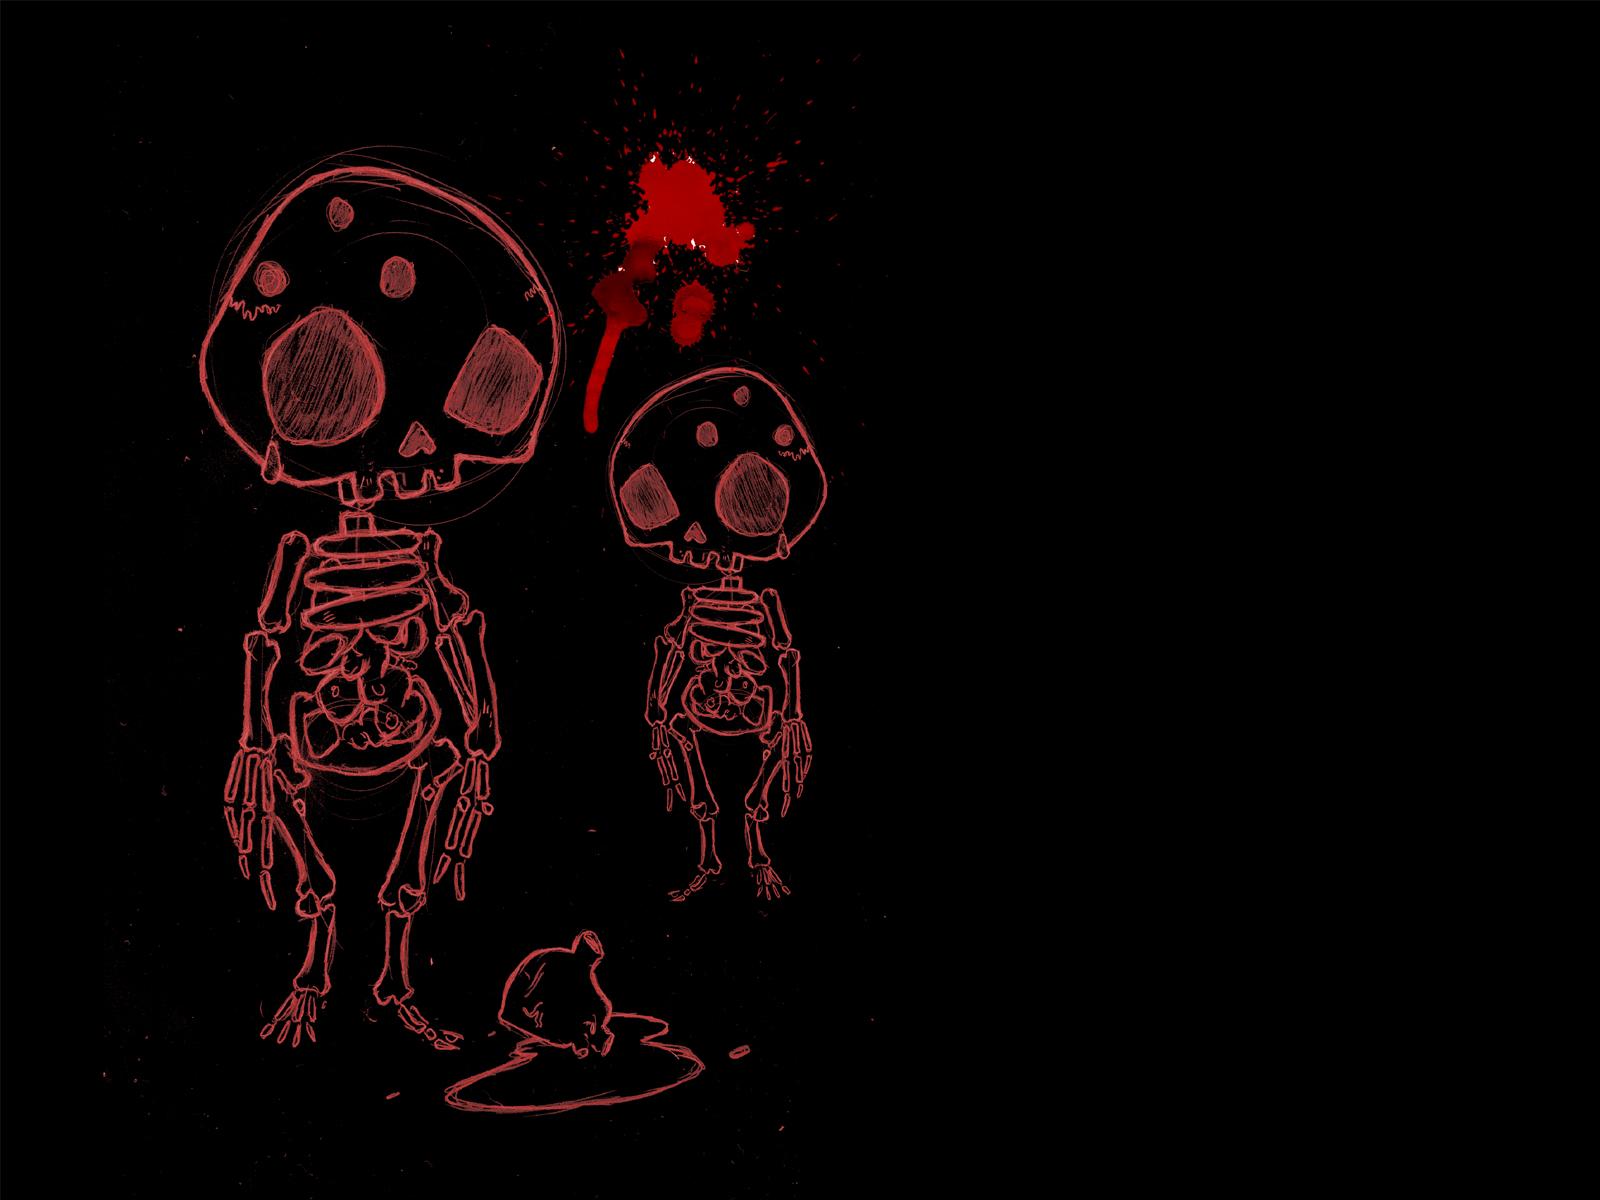 http://2.bp.blogspot.com/_-6qXtAjAyoo/TDcLRv8aZtI/AAAAAAAAAl4/PT43a12Gqz8/s1600/wallpaper_by_ghostserver.jpg